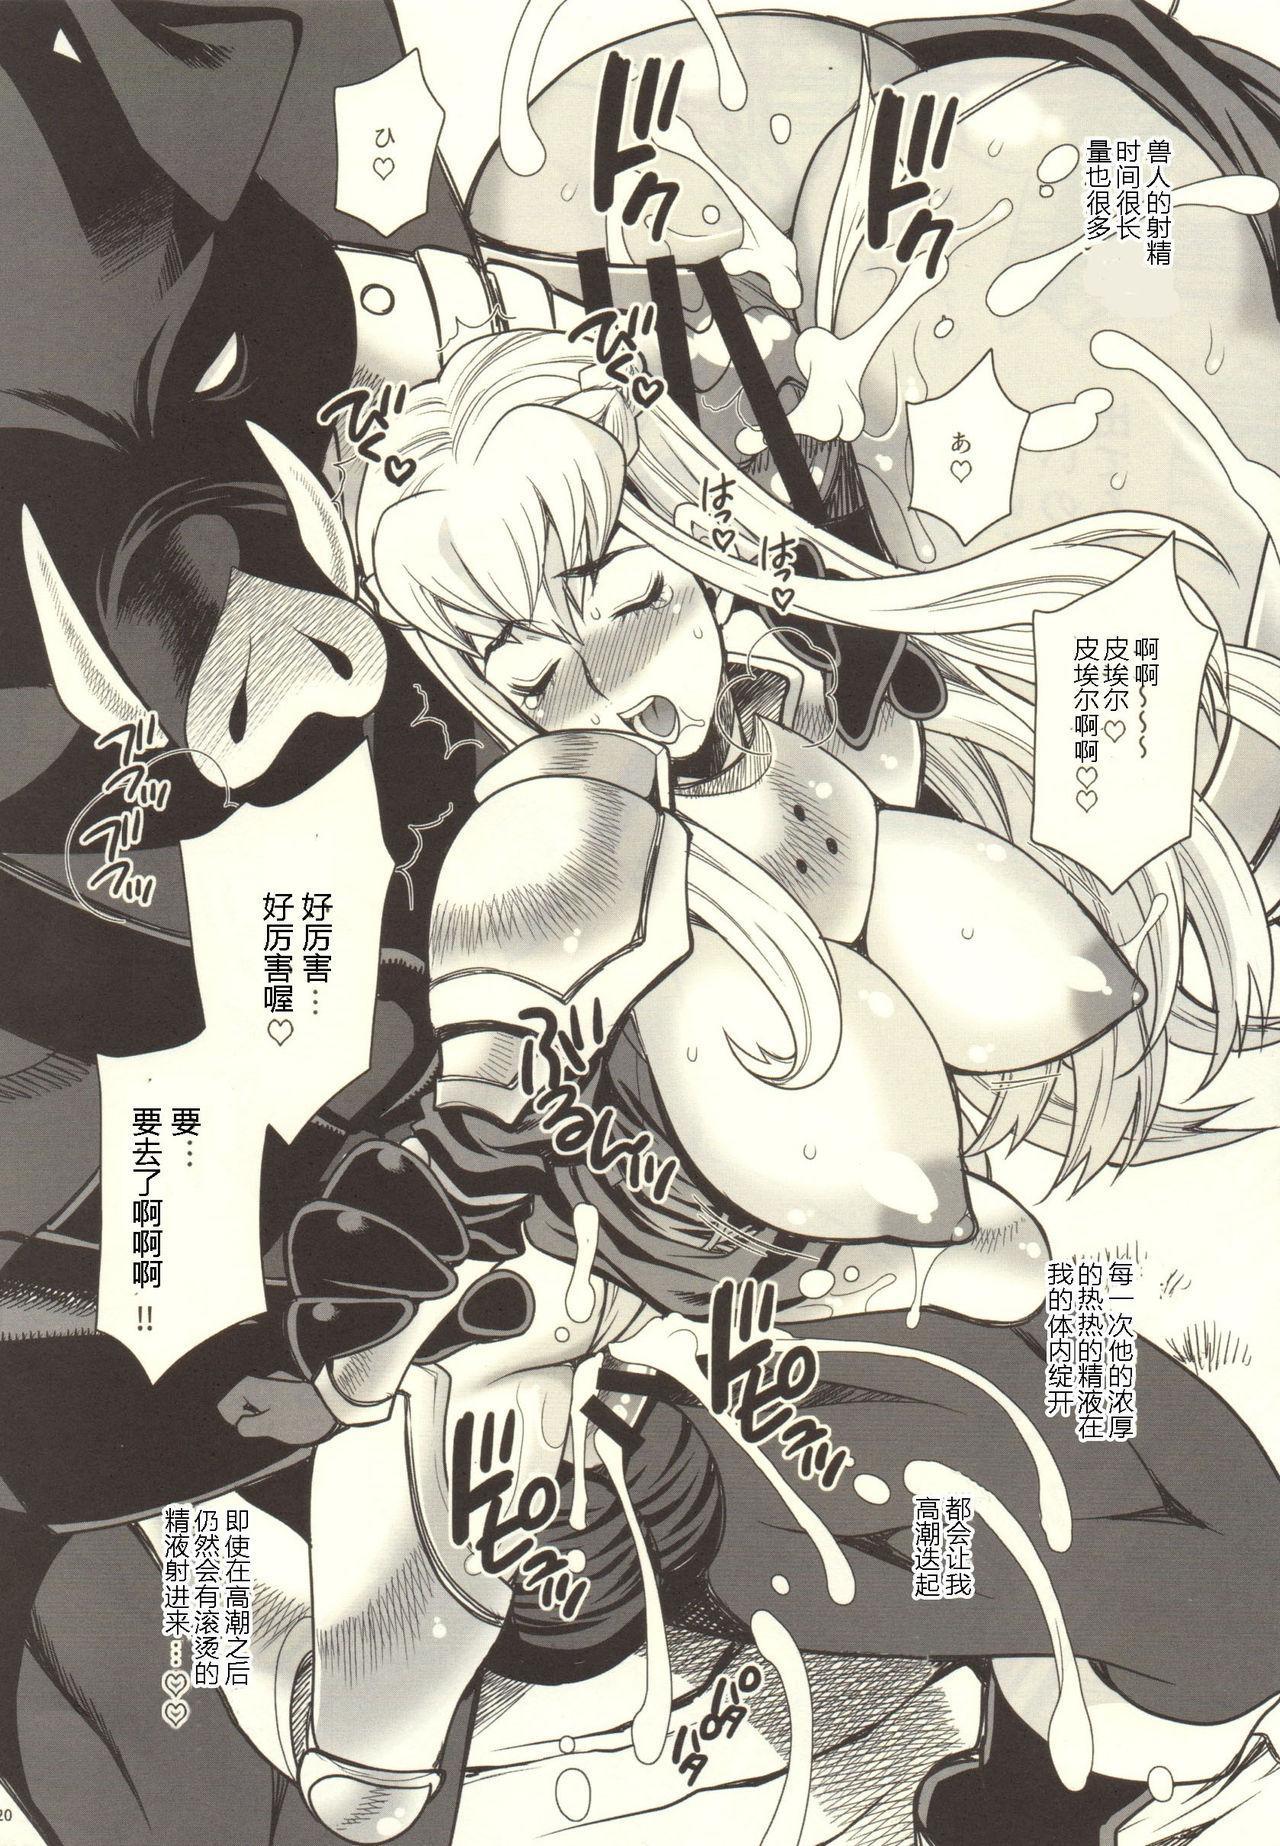 Yukiyanagi no Hon 37 Buta to Onnakishi - Lady knight in love with Orc 18